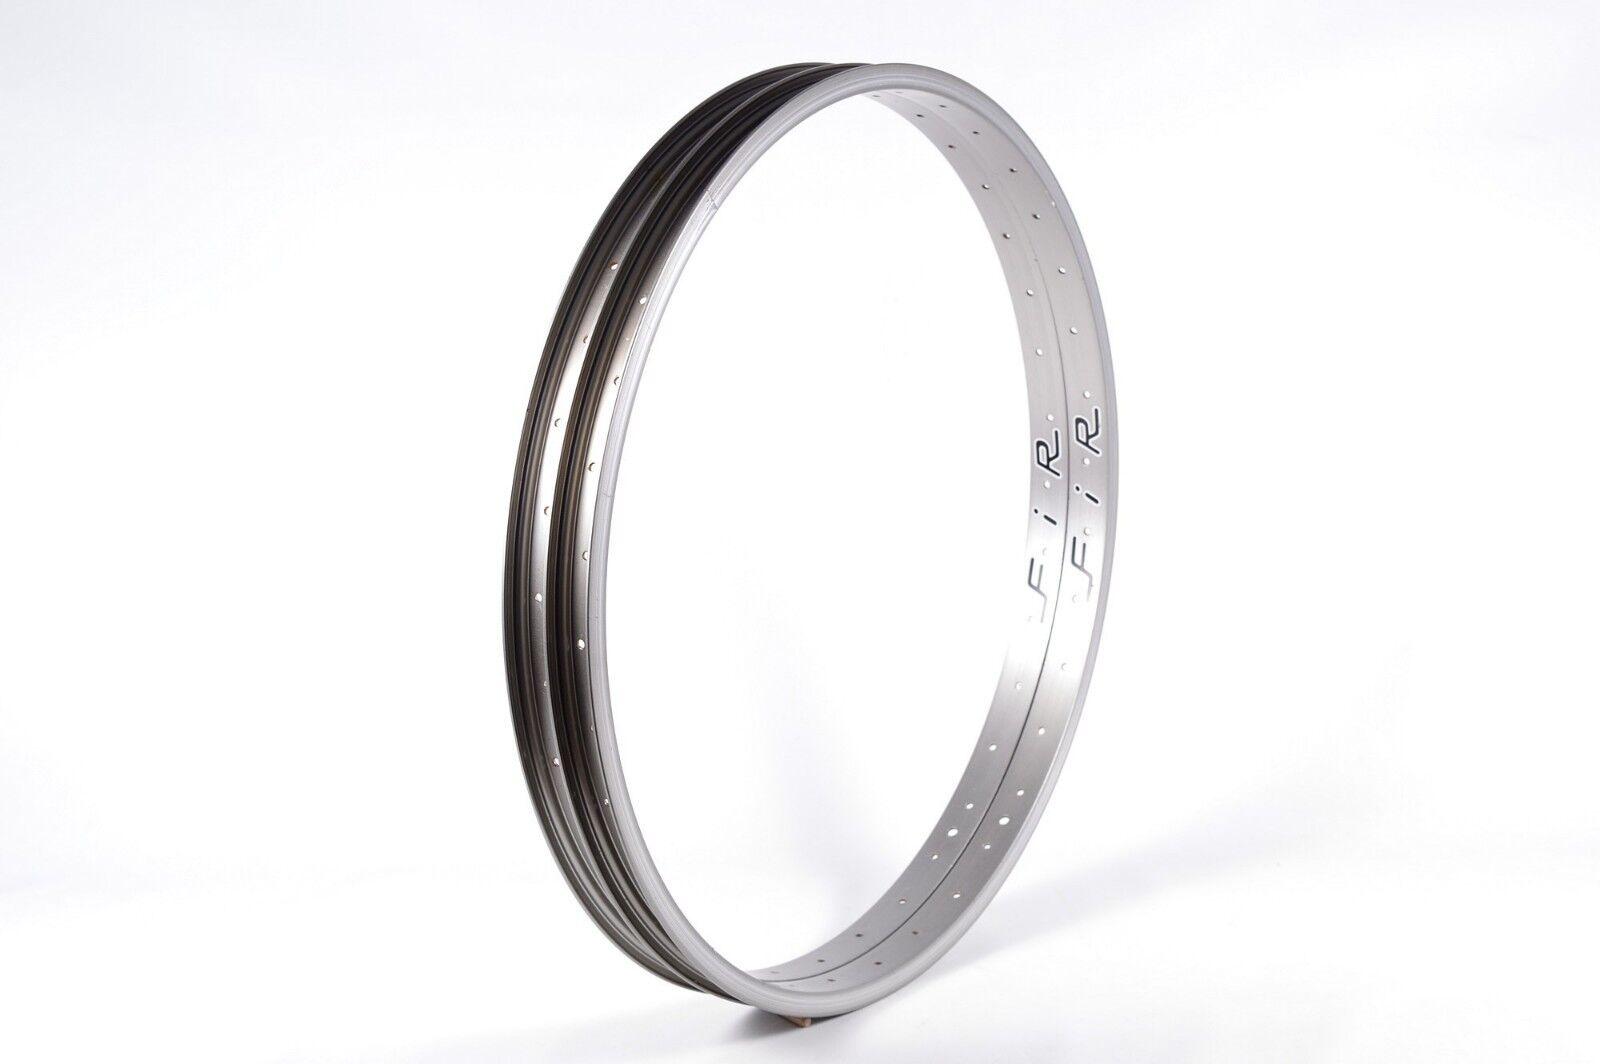 FIR ABX31 Mountain Bike MTB  Wheels Rim Set 36H 31mm Wide Good Condition  shop online